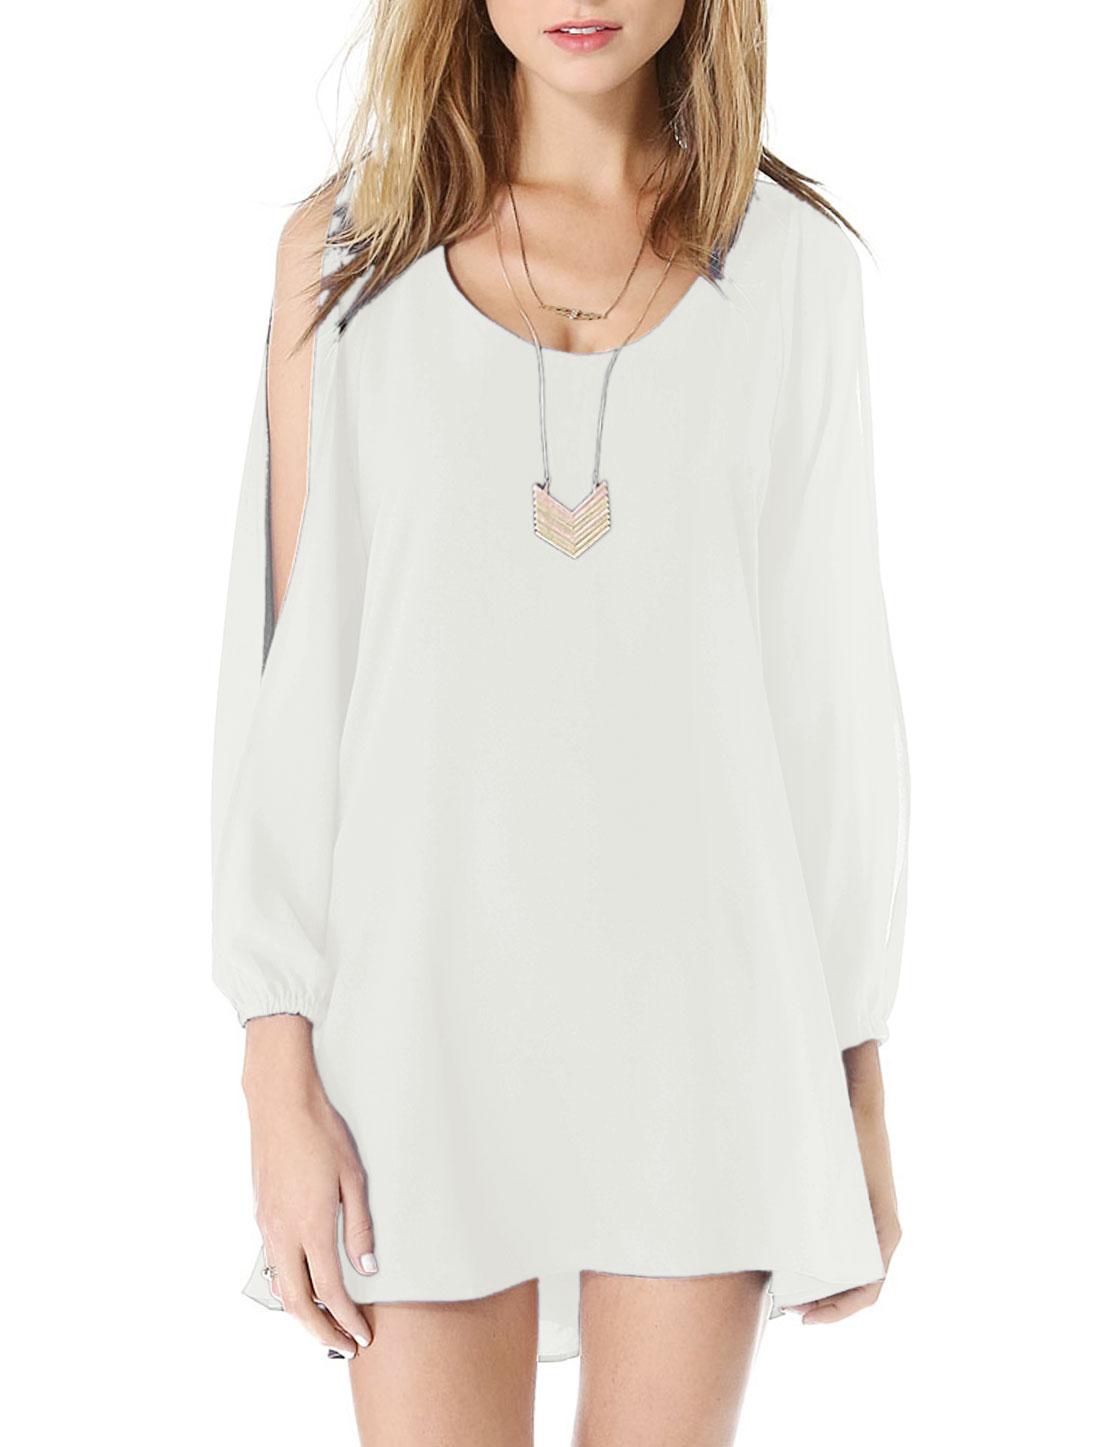 Lady Cut Out Sleeve Elastic Cuff Casual Chiffon Shift Dress White M